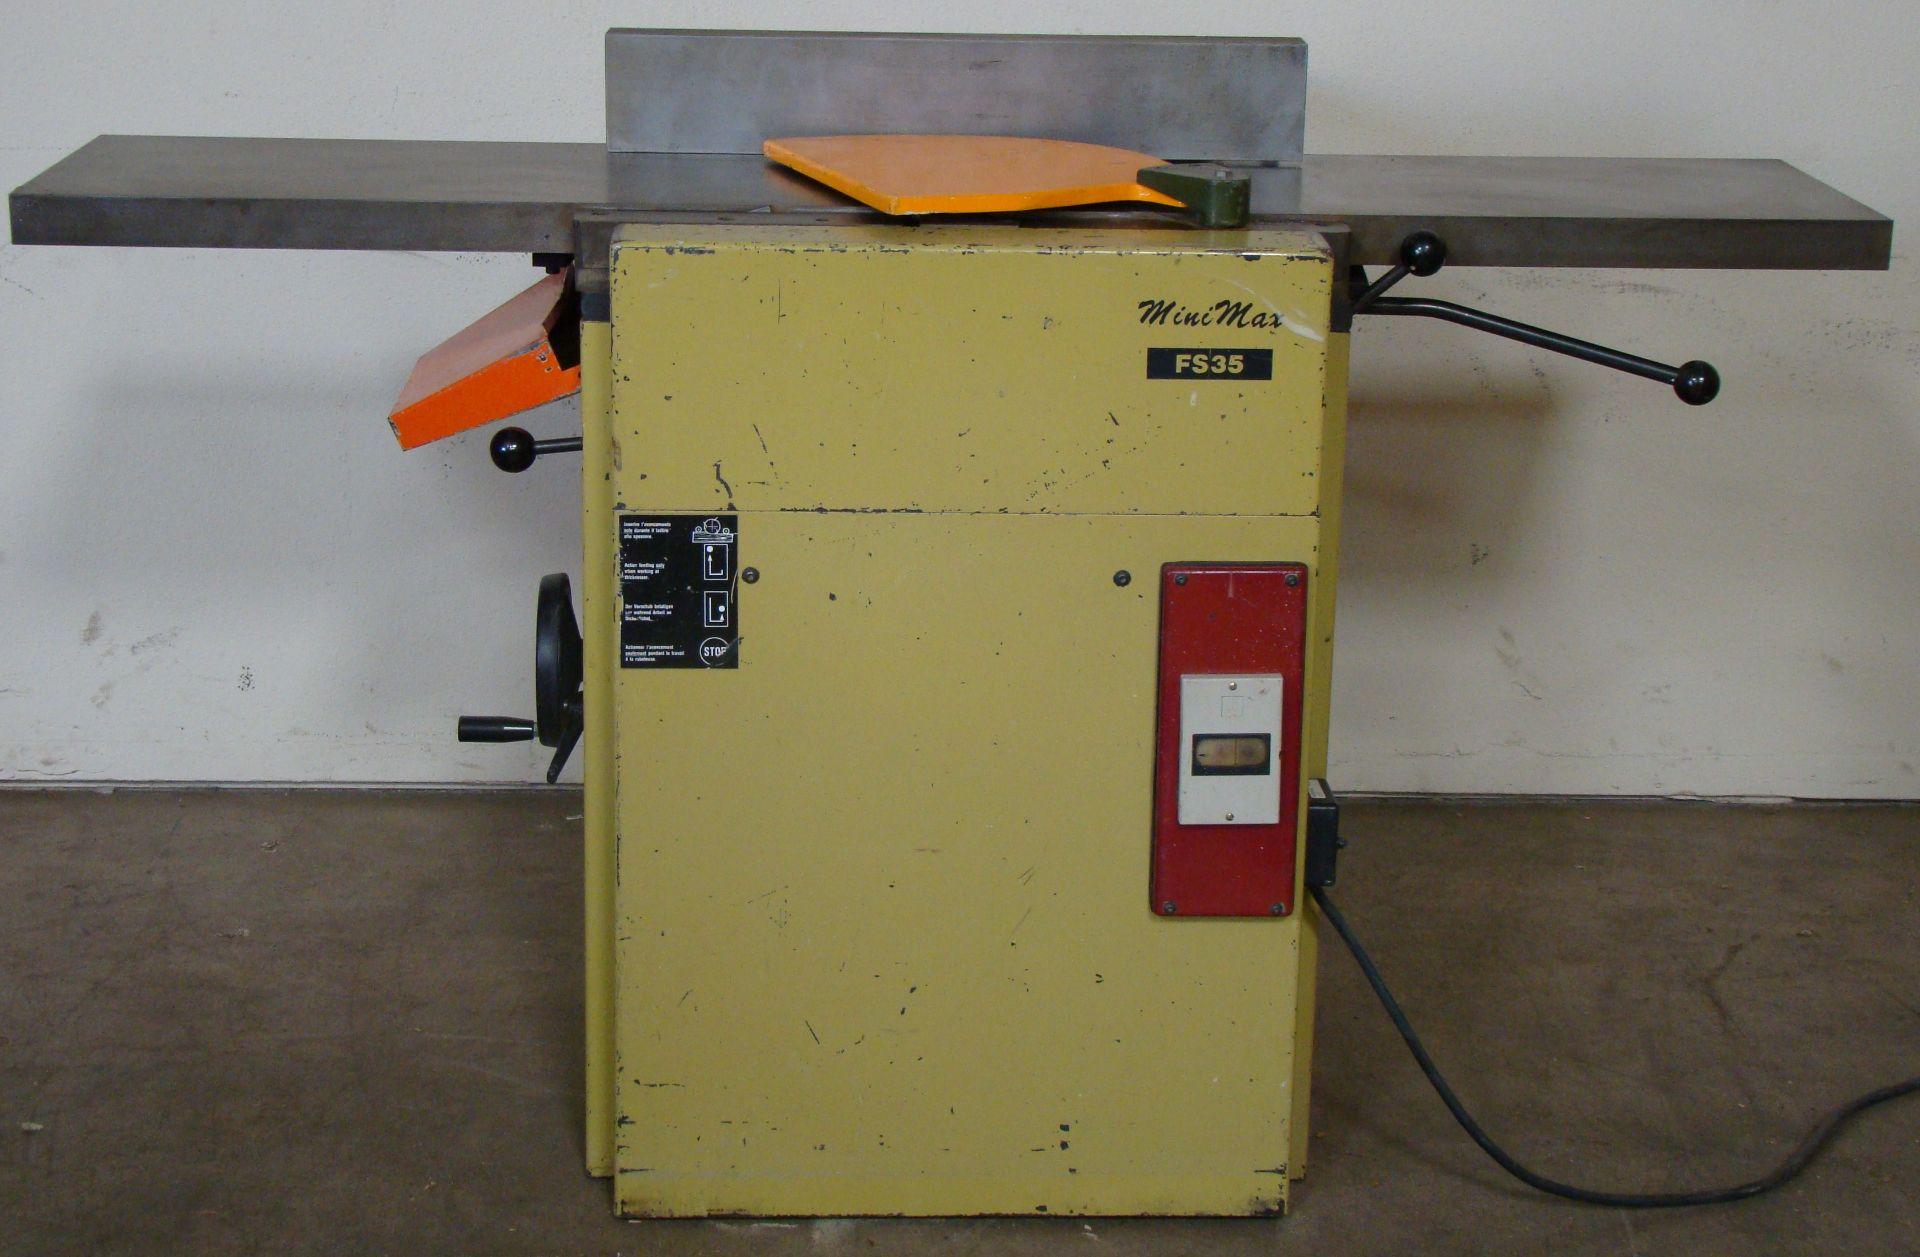 "Lot 30 - SCMI Mini-Max FS-35 14"" Joiner/Planer/Mortiser 3HP 230/460 Volt 3PH"